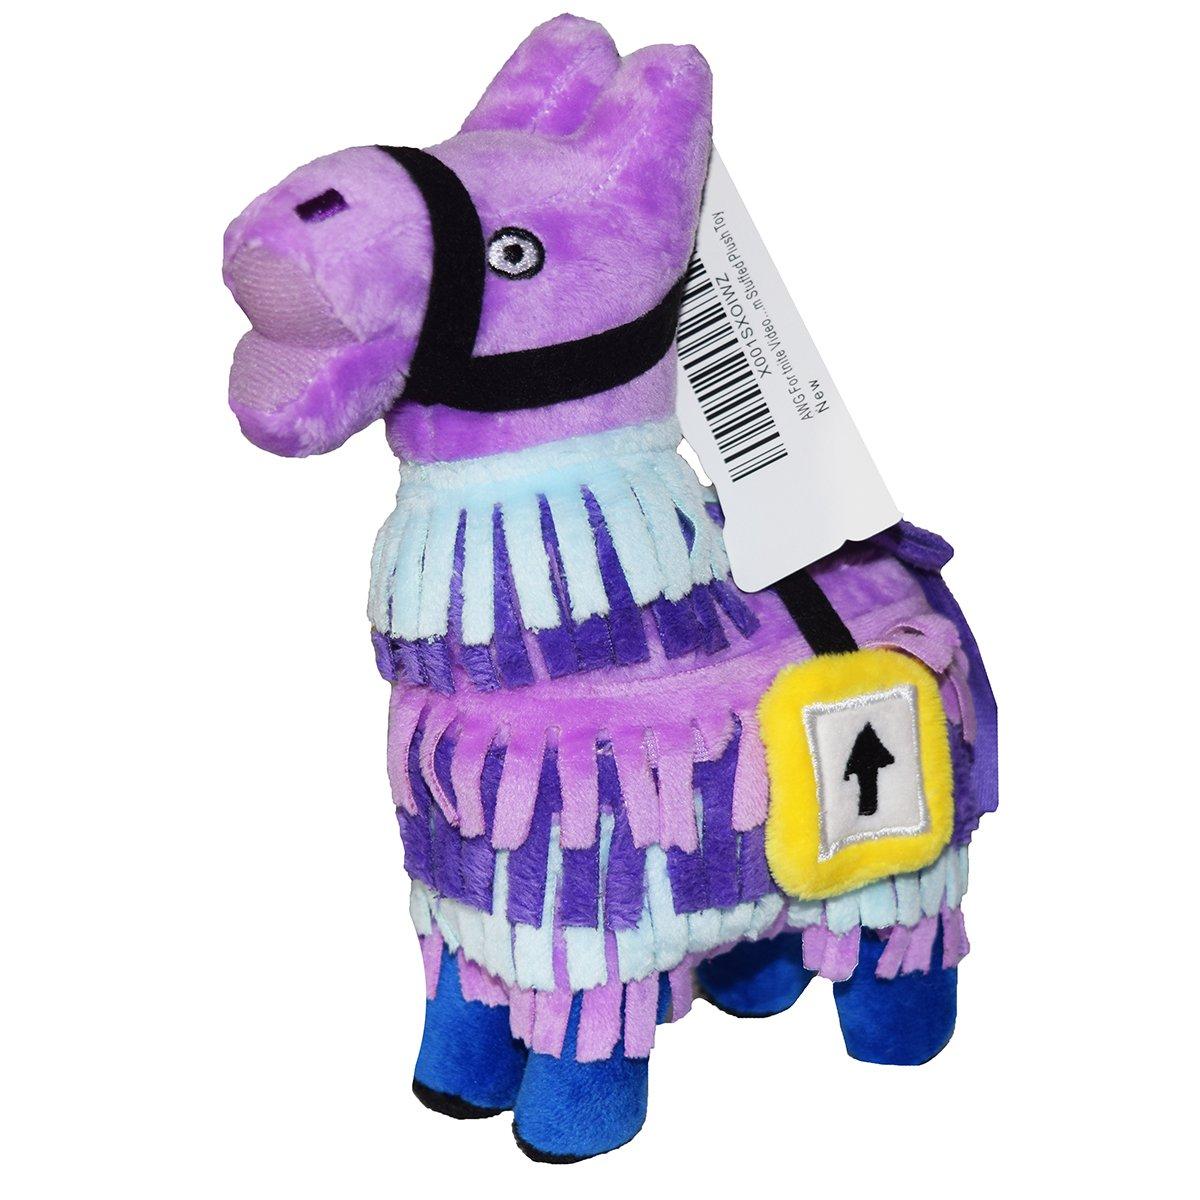 Anime World Gifts - Loot Supply Llama 20cm Stuffed Plush Toy